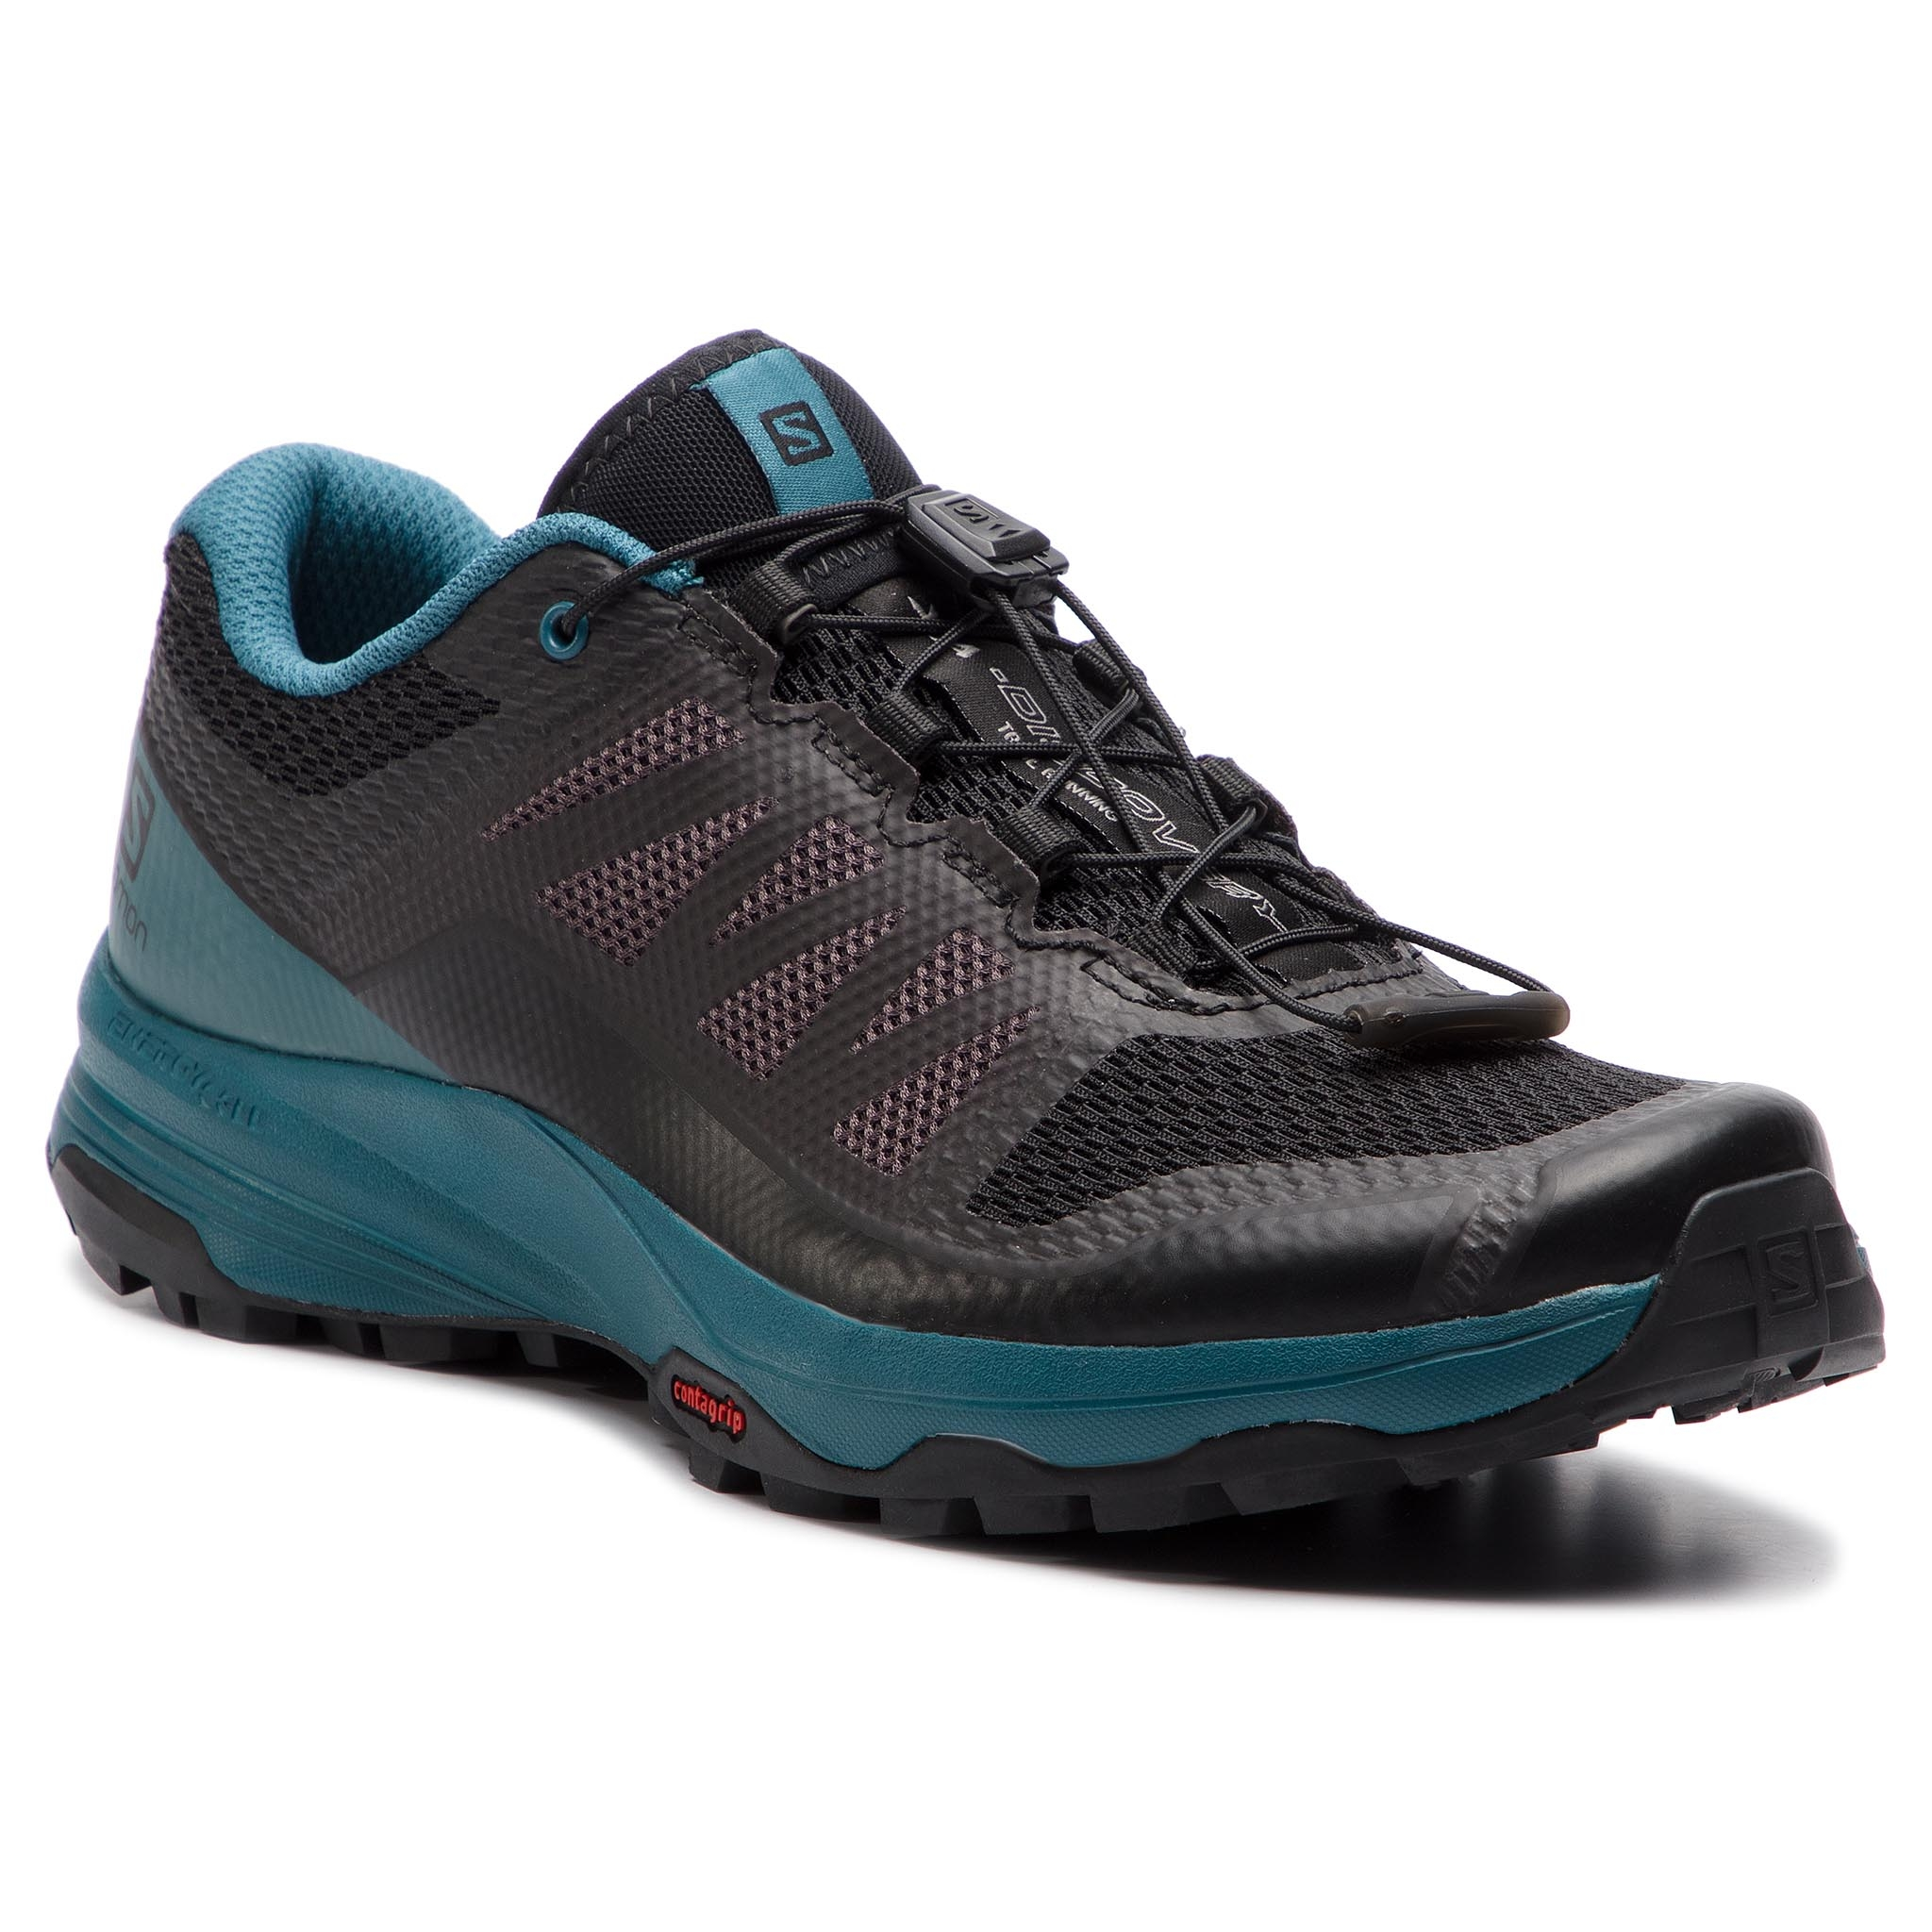 Topánky SALOMON - Xa Discovery 406619 27 W0 Black/Mallard Blue/Ebony